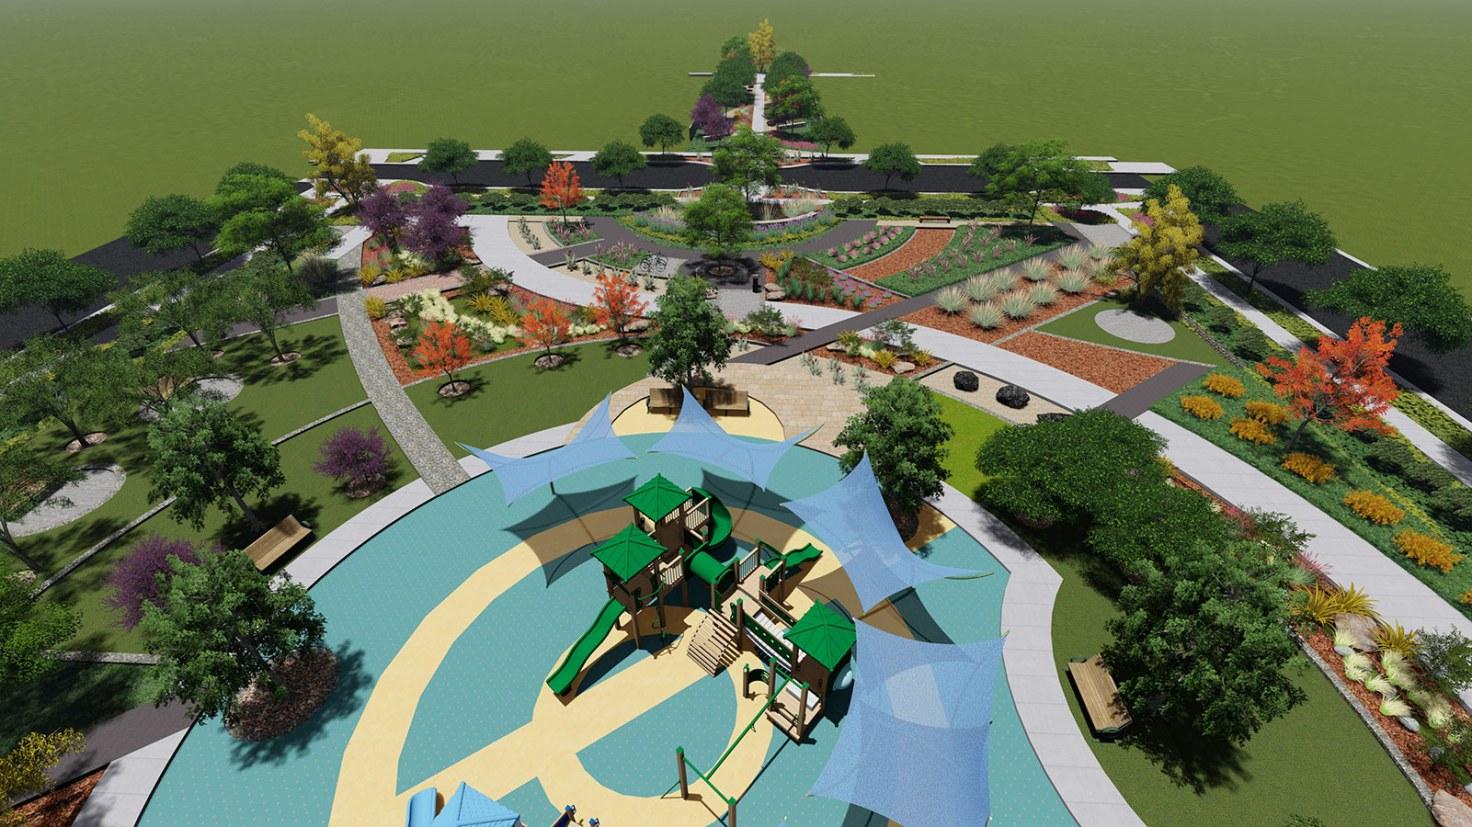 Street Park Conceptual